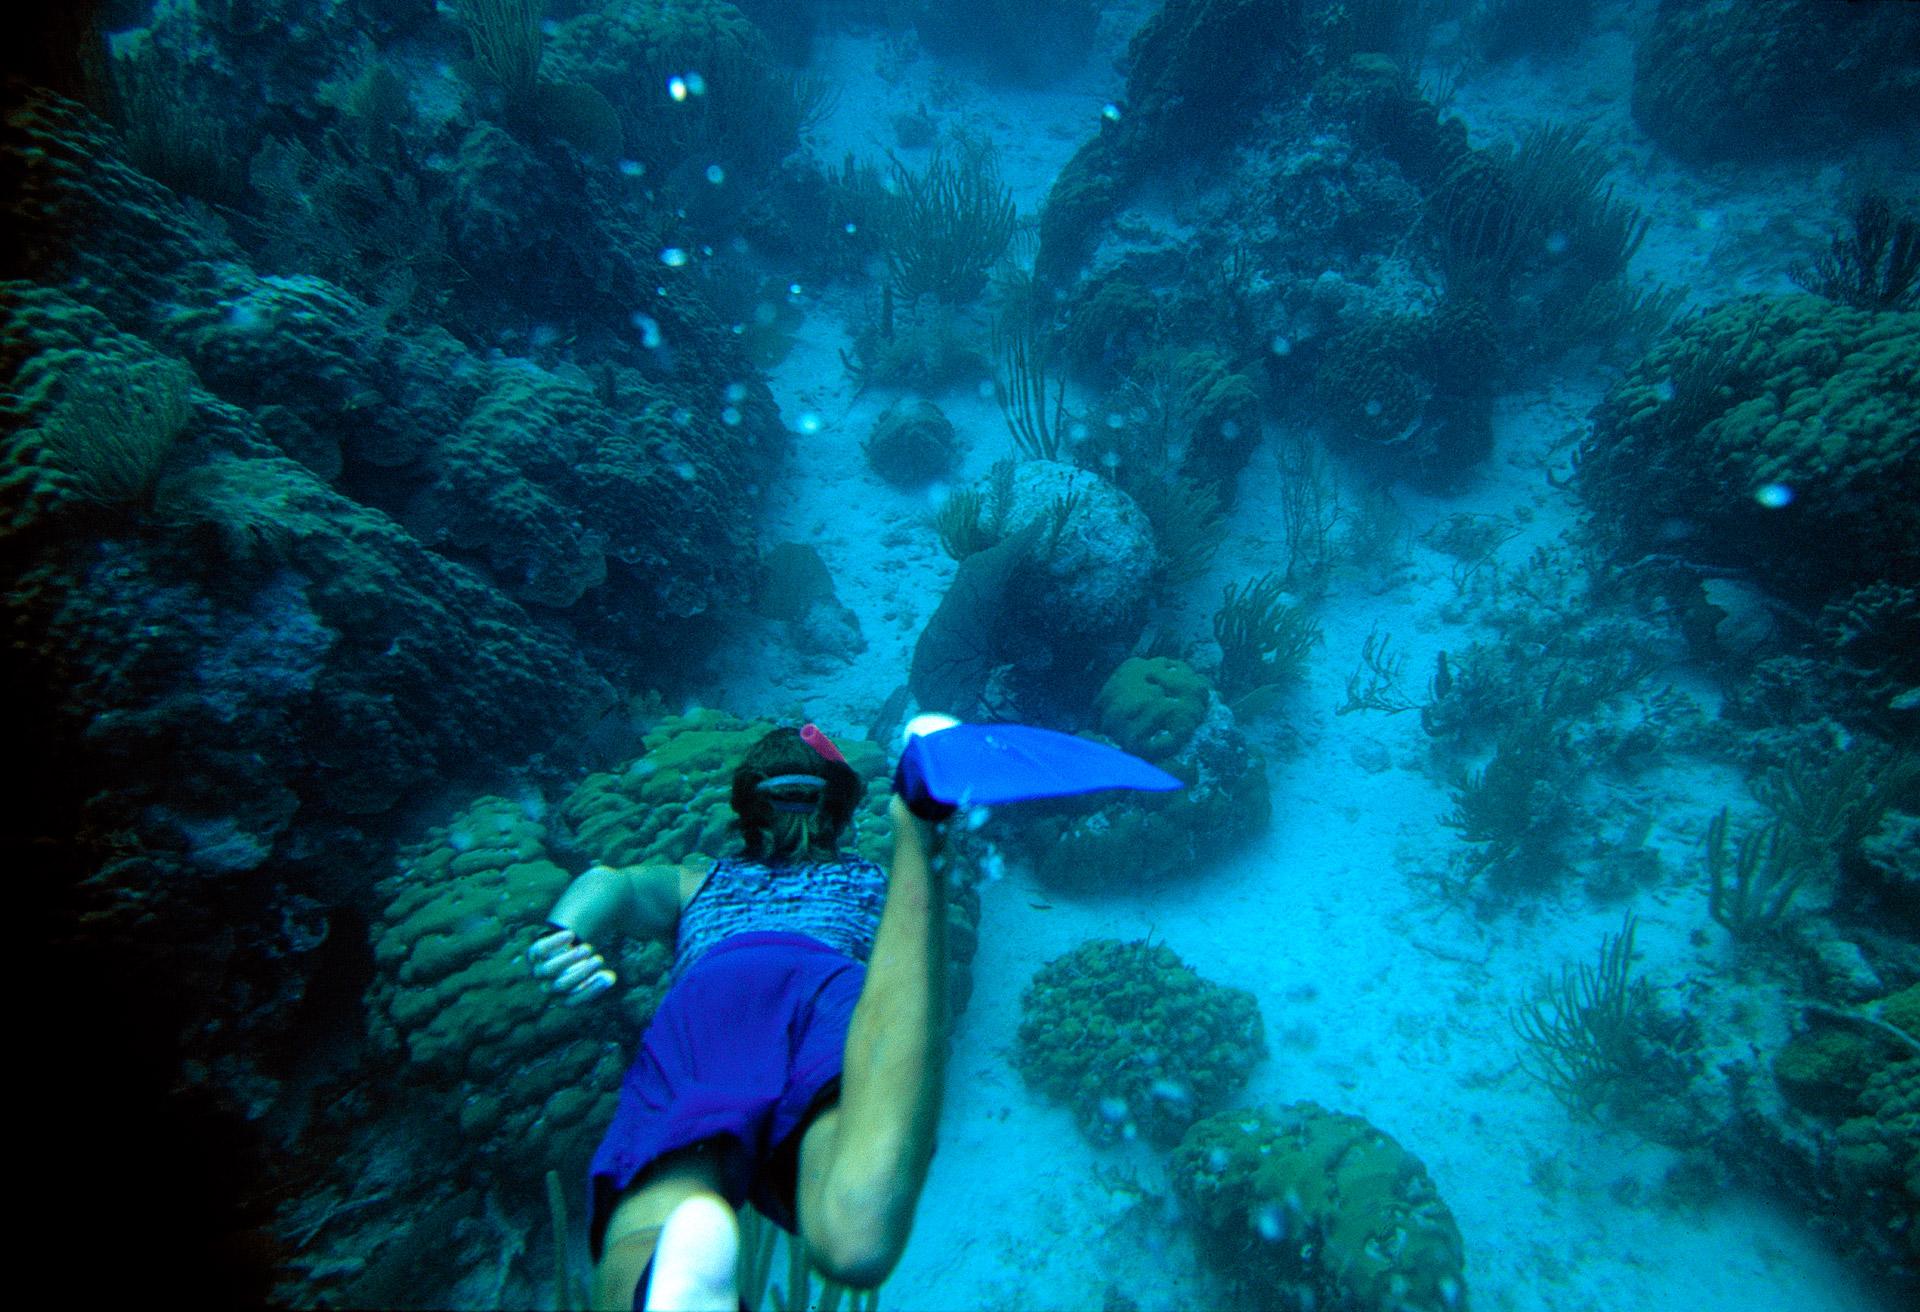 Man snorkeling off Cay Caulker in Belize